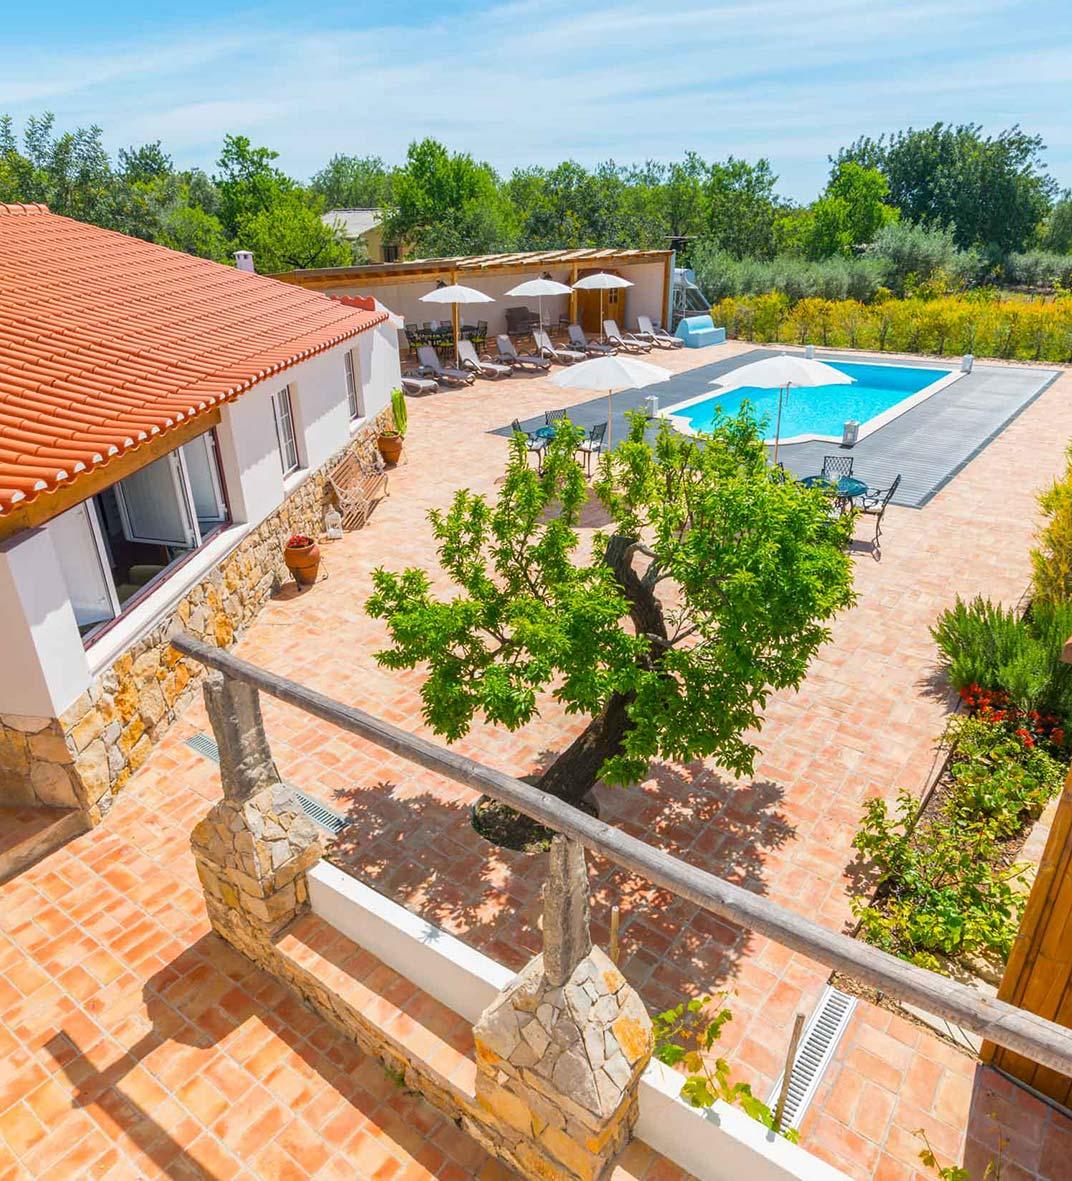 Villa Oliva facilities